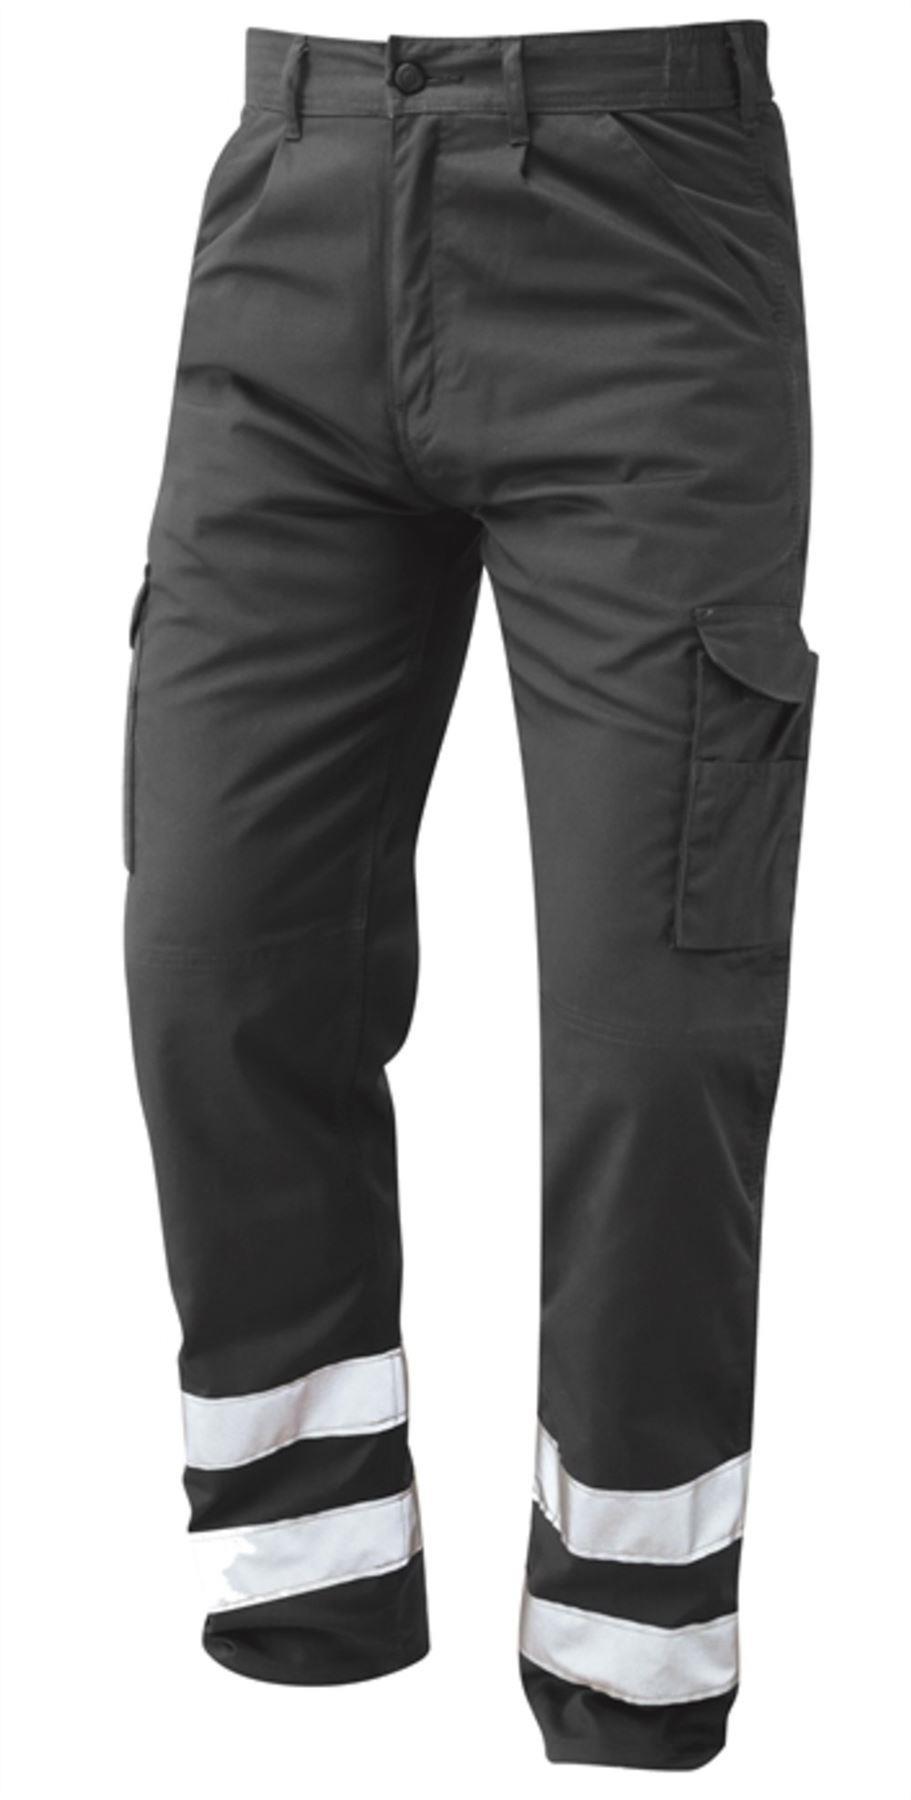 Orn Condor Hi Vis Kneepad Trousers - Graphite Grey|44W29L